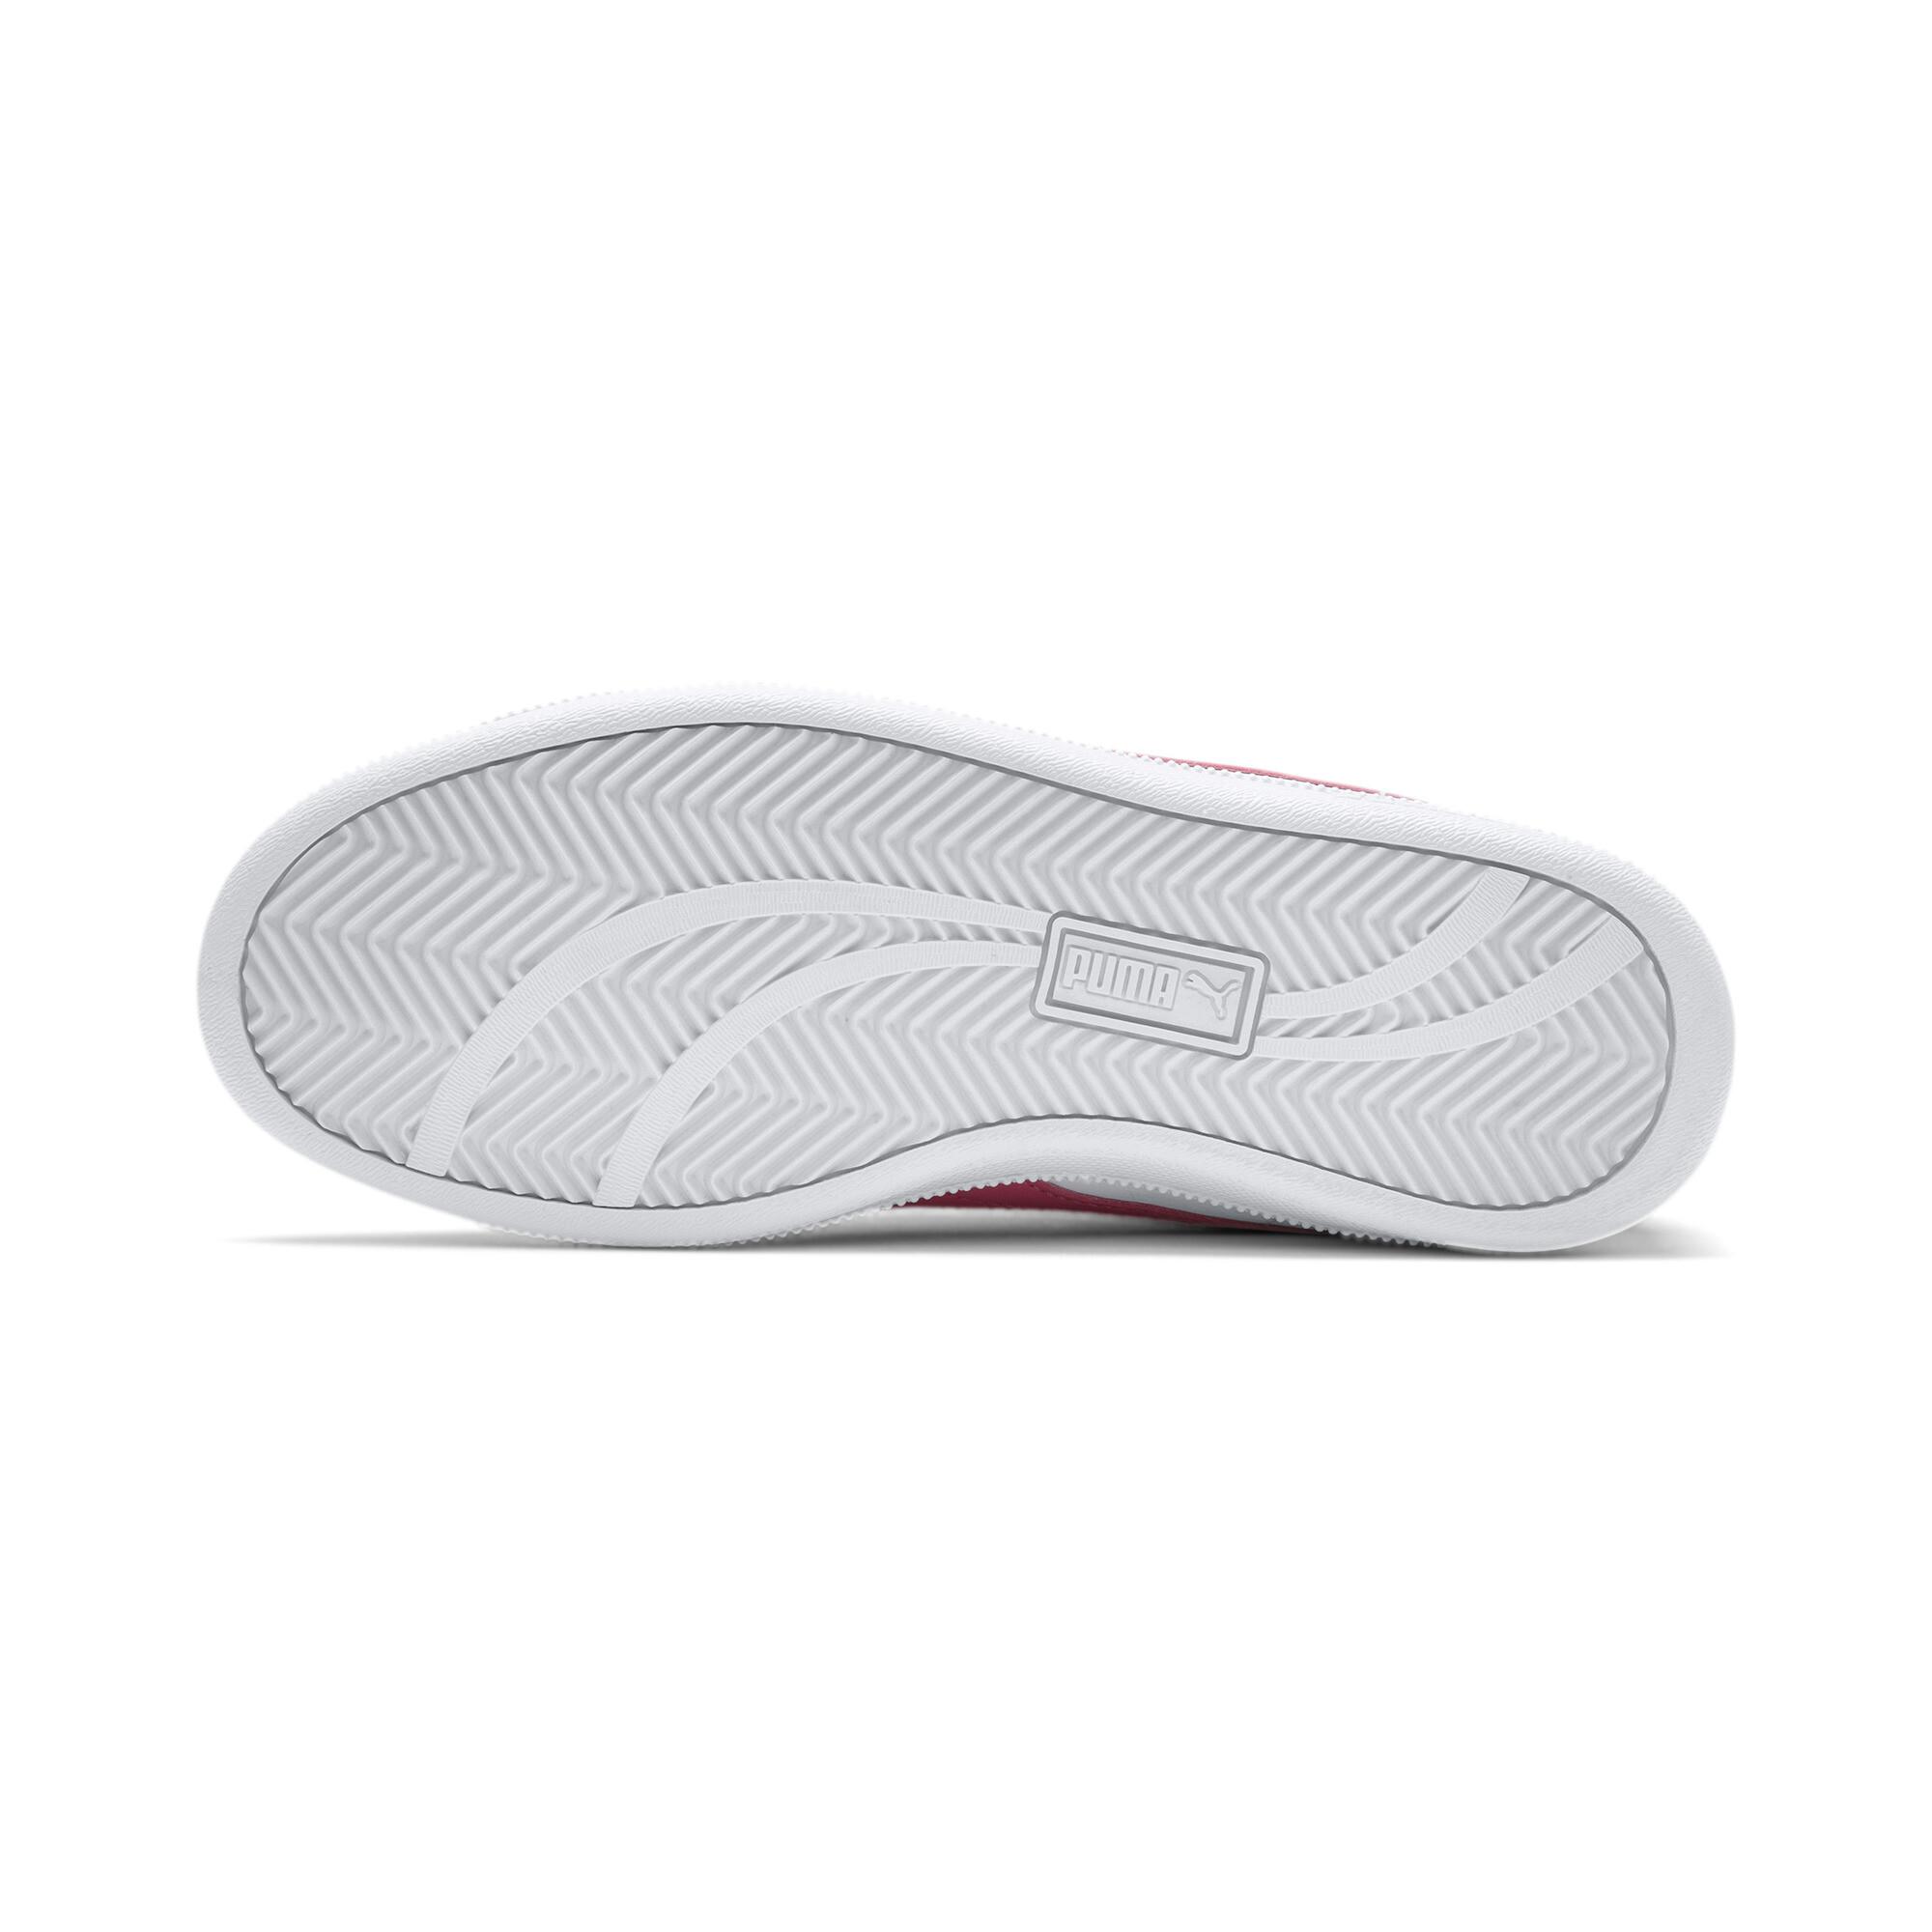 PUMA-Smash-Jr-Sneaker-Unisex-Schuhe-Kinder-Neu Indexbild 20